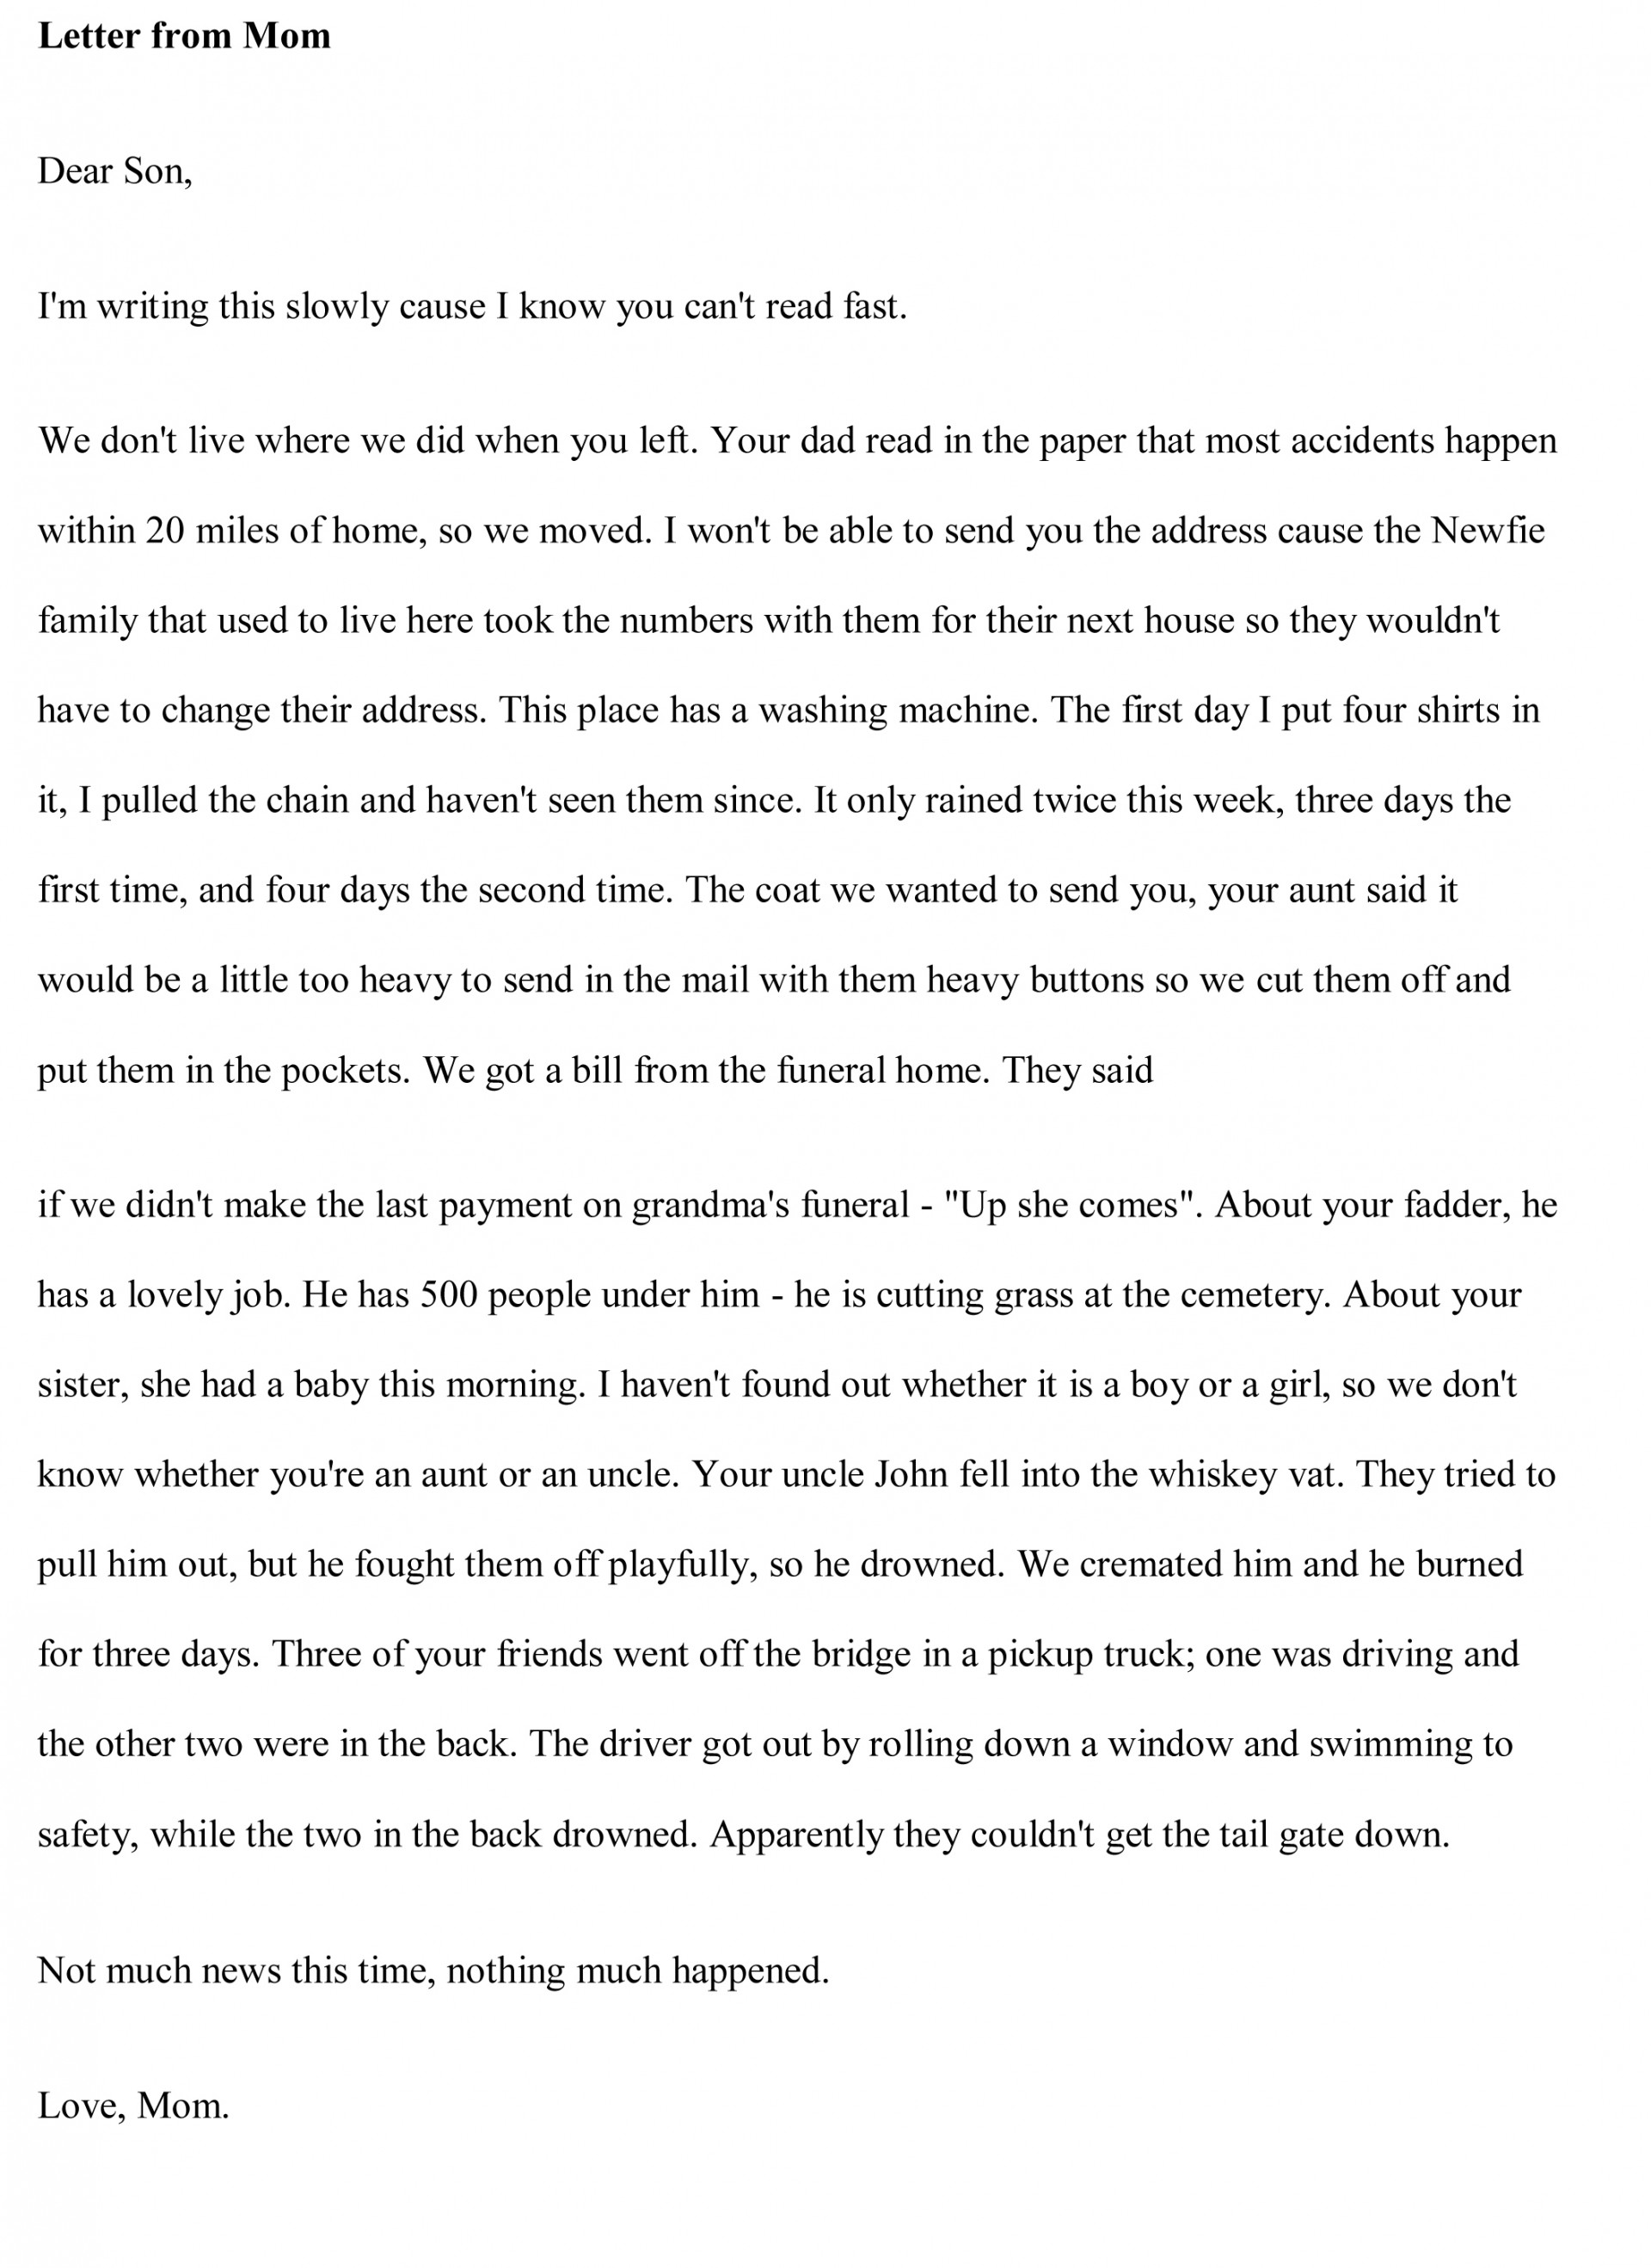 013 Essay Example Funny Free Sample Persuasive Excellent College Level 1920